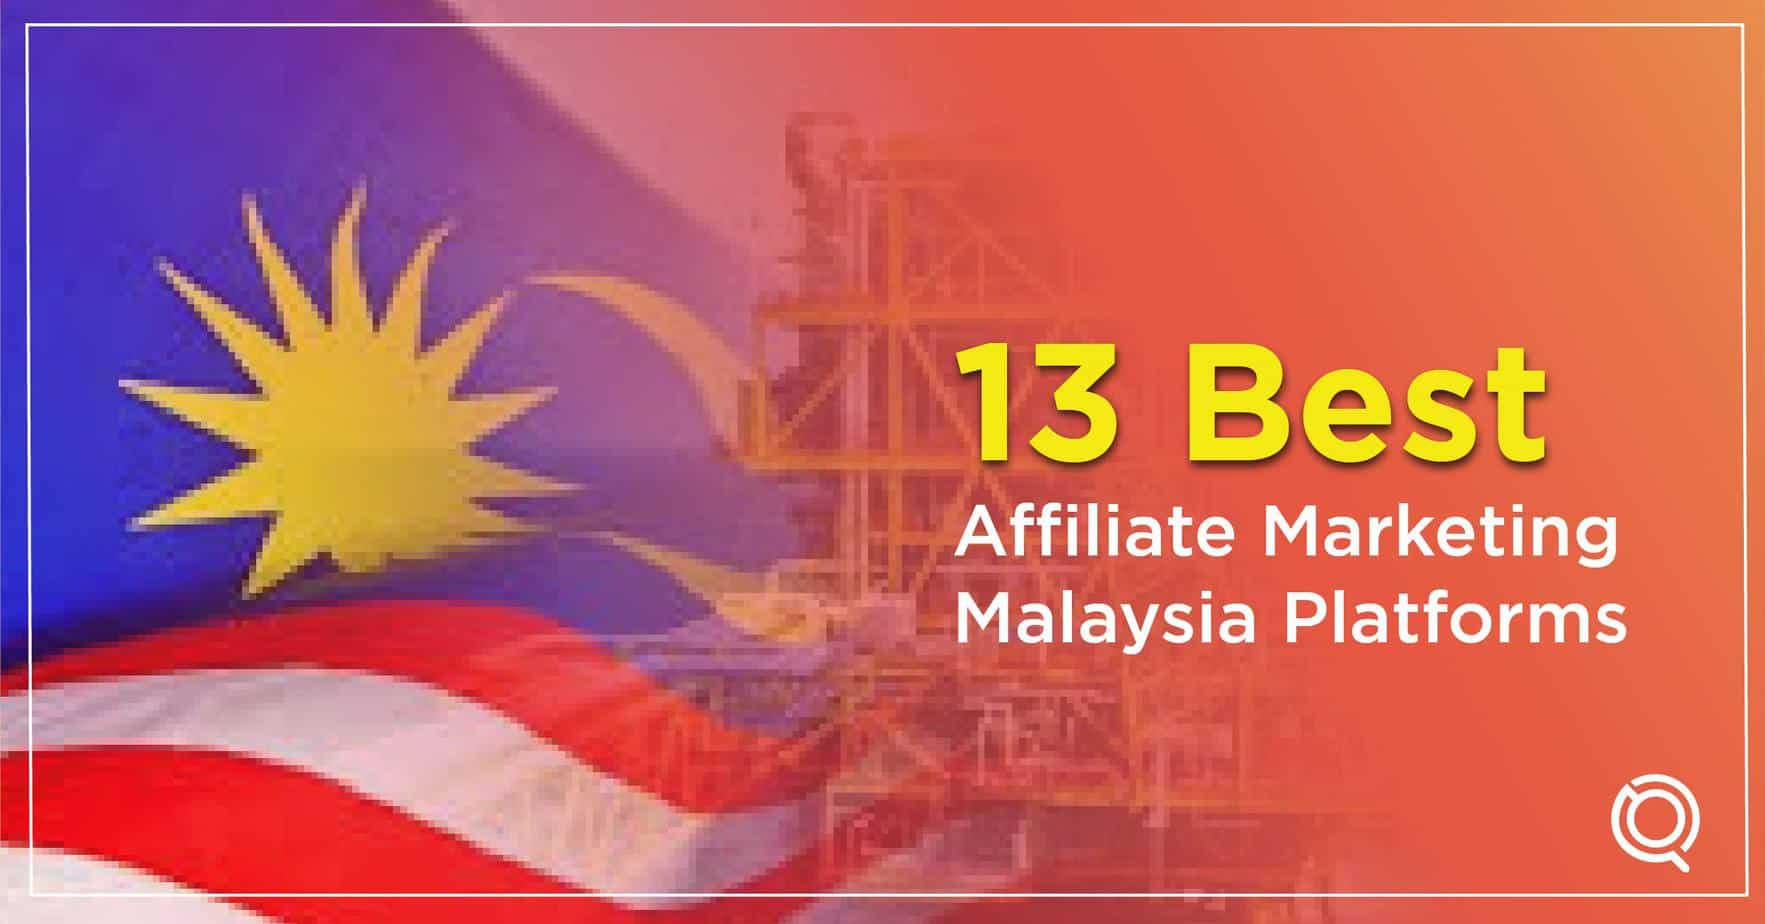 13 Best Affiliate Marketing Malaysia Platforms - Top Affiliate Program Malaysia by One Search Pro Digital Marketing Agency Malaysia